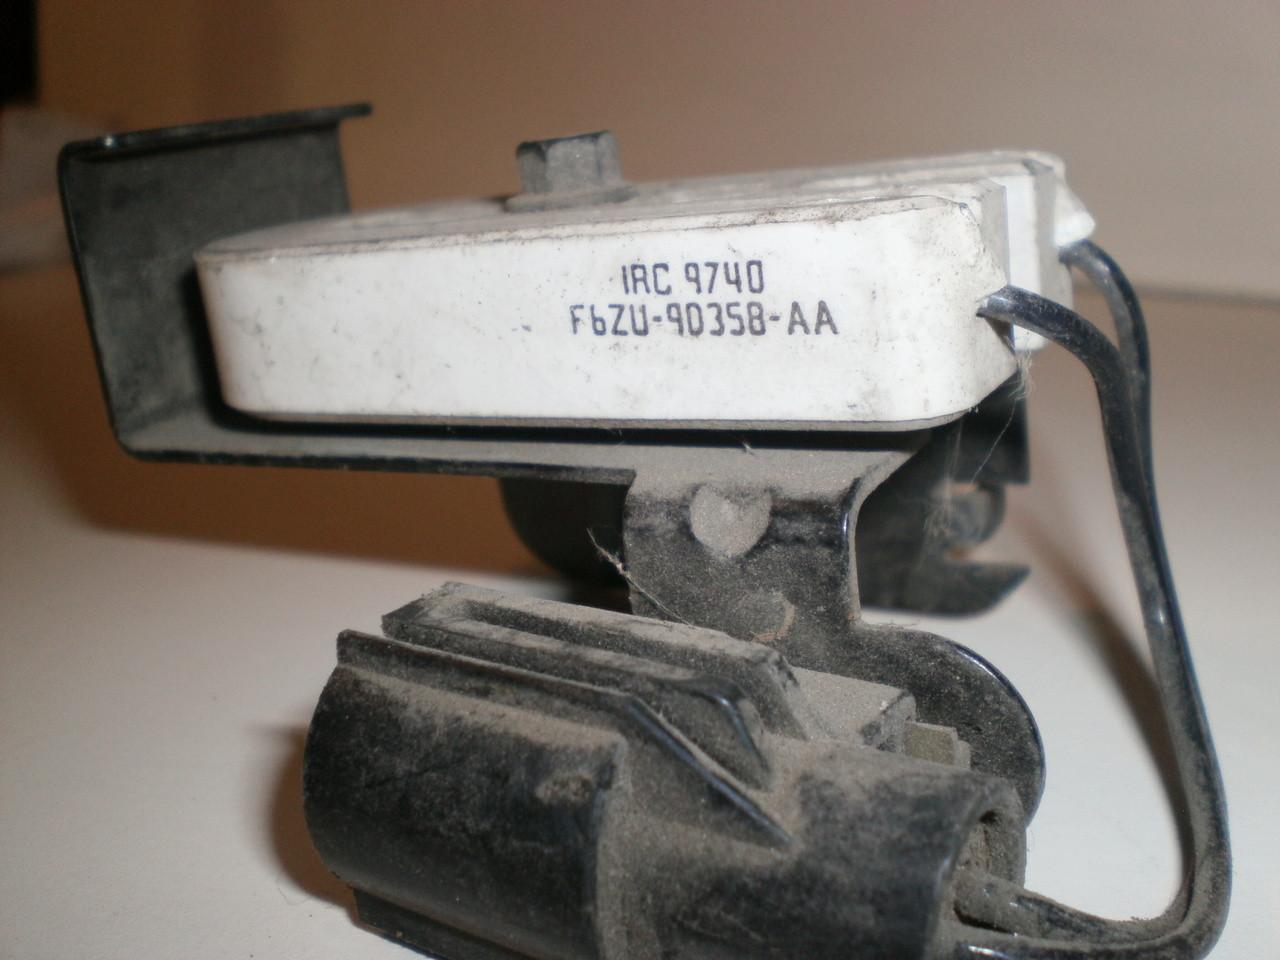 1996 1998 Ford Mustang 46 Gt Cobra Fuel Pump Resistor Under Fender Filter Location Larger More Photos